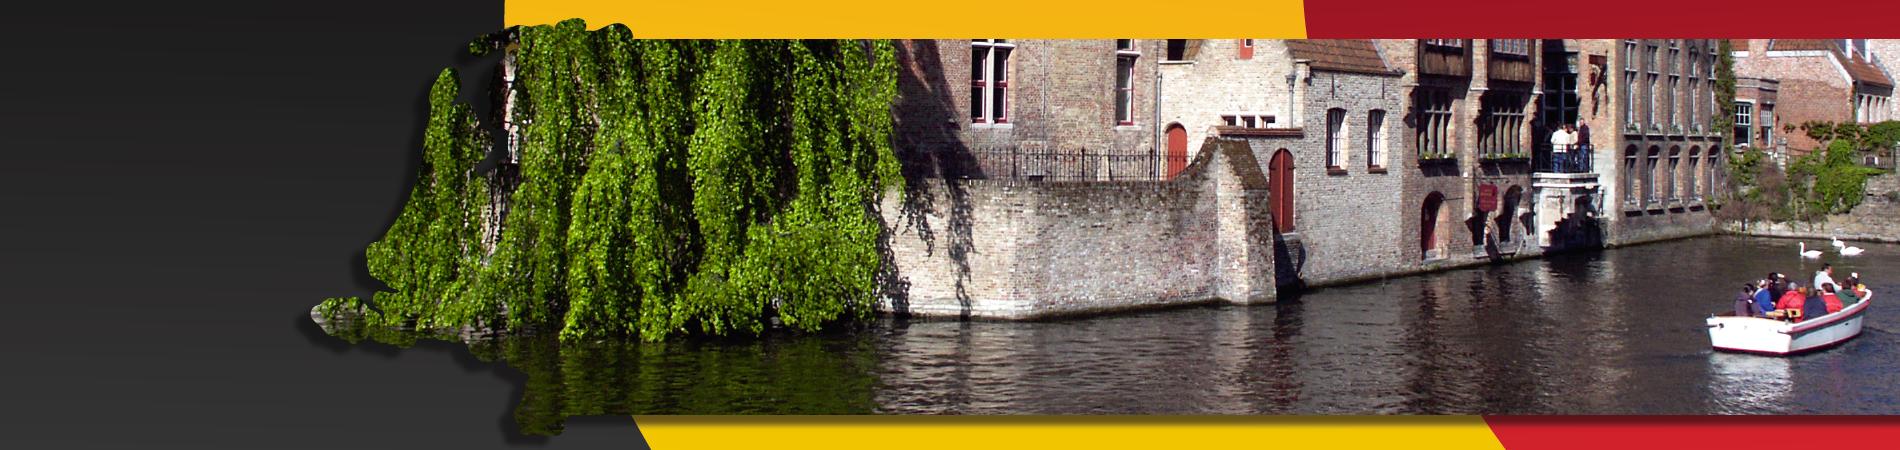 Canal Rozenhoed Brugge